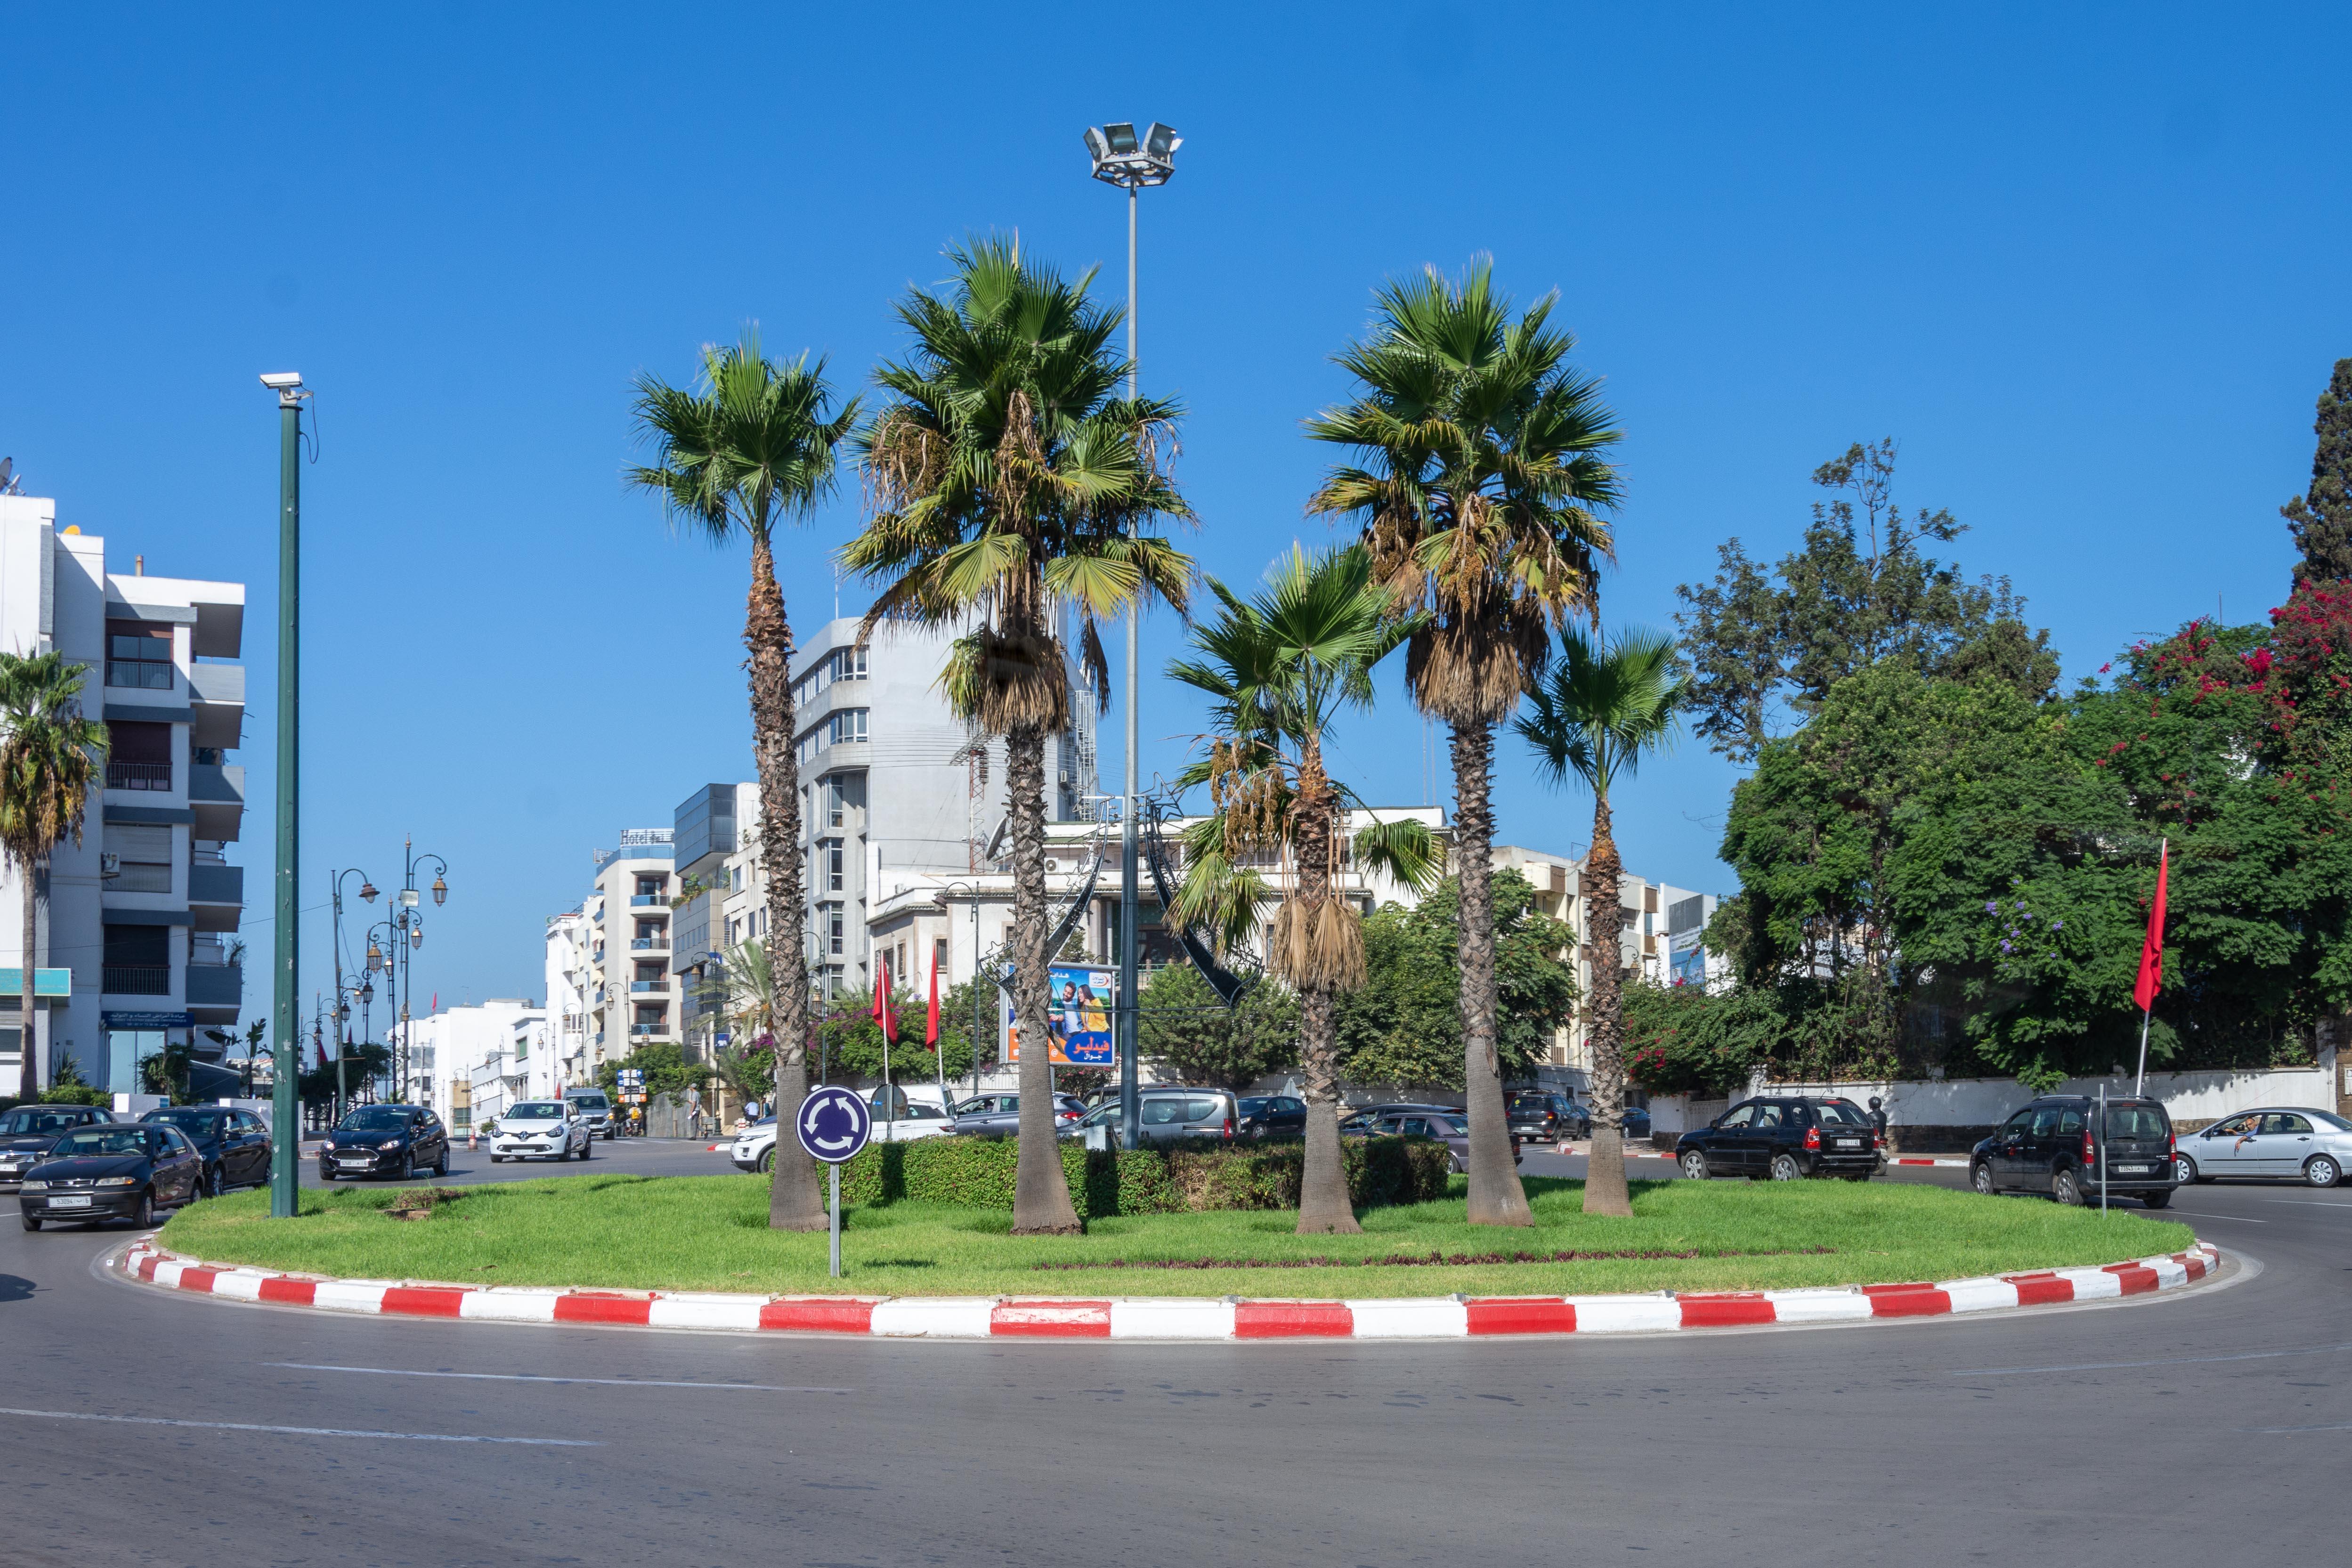 20181002_Marokko_028